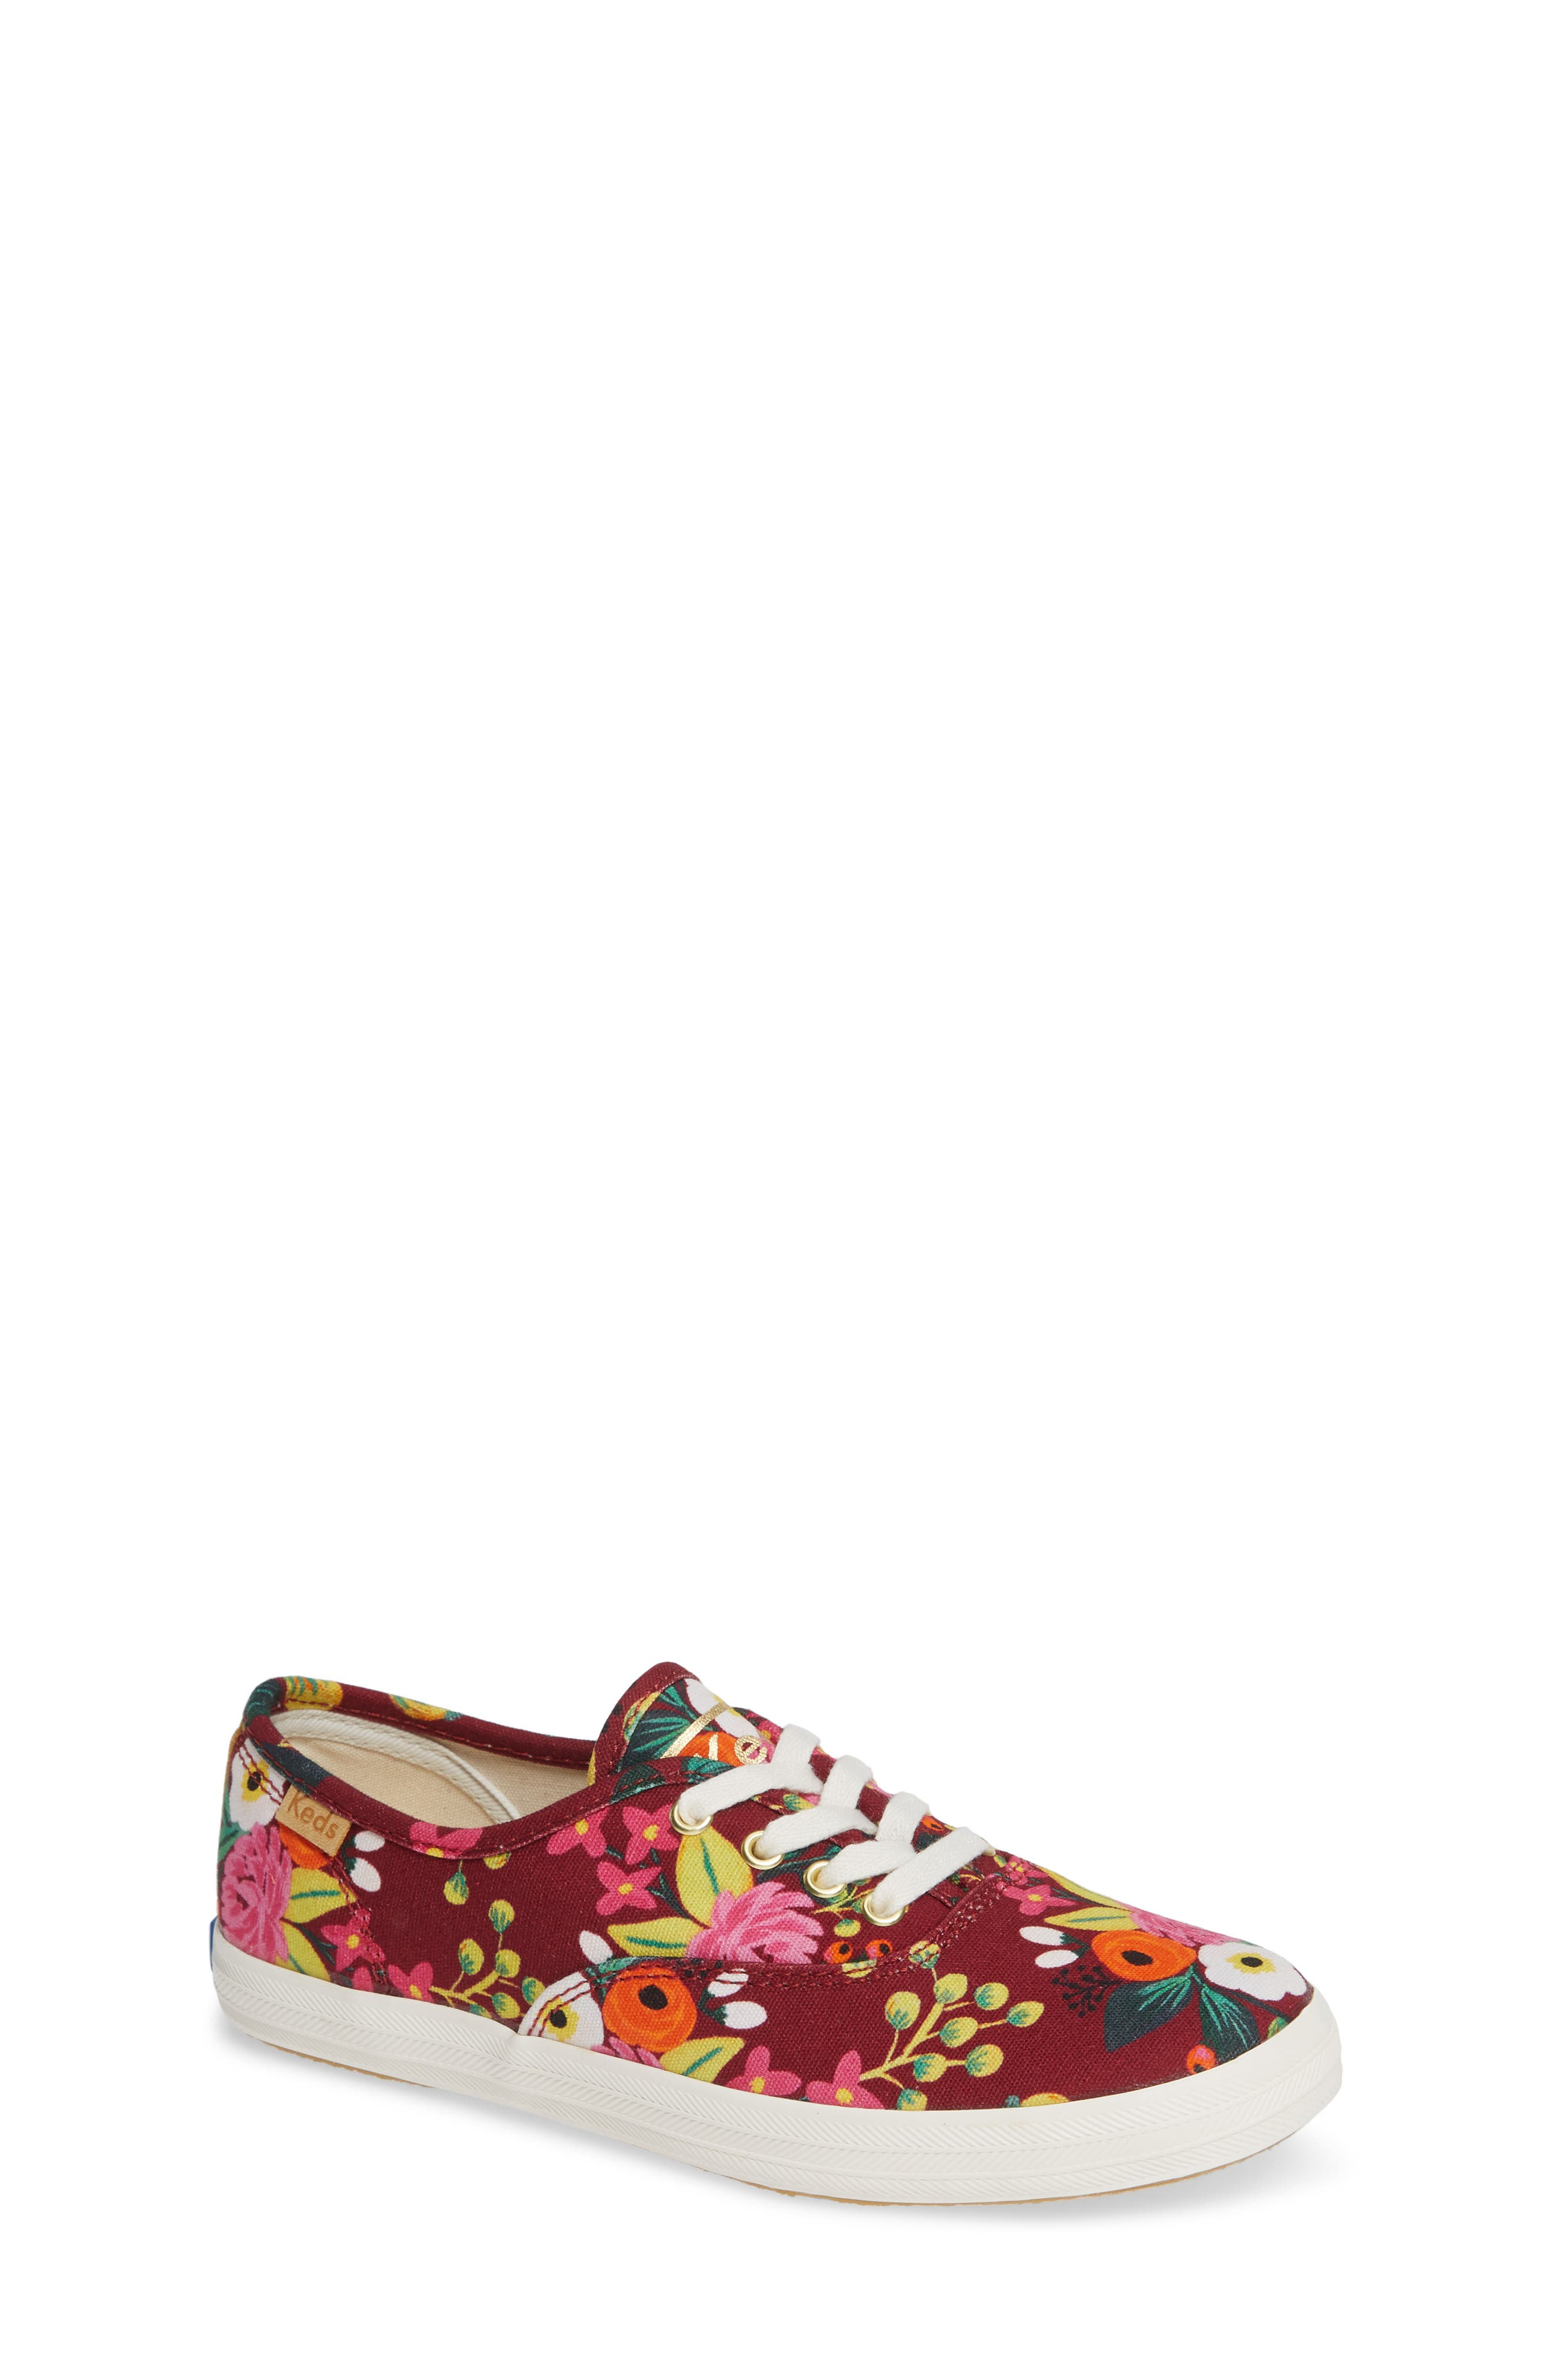 x Rifle Paper Co. Floral Print Champion Sneaker,                         Main,                         color, VINTAGE BLOSSOM